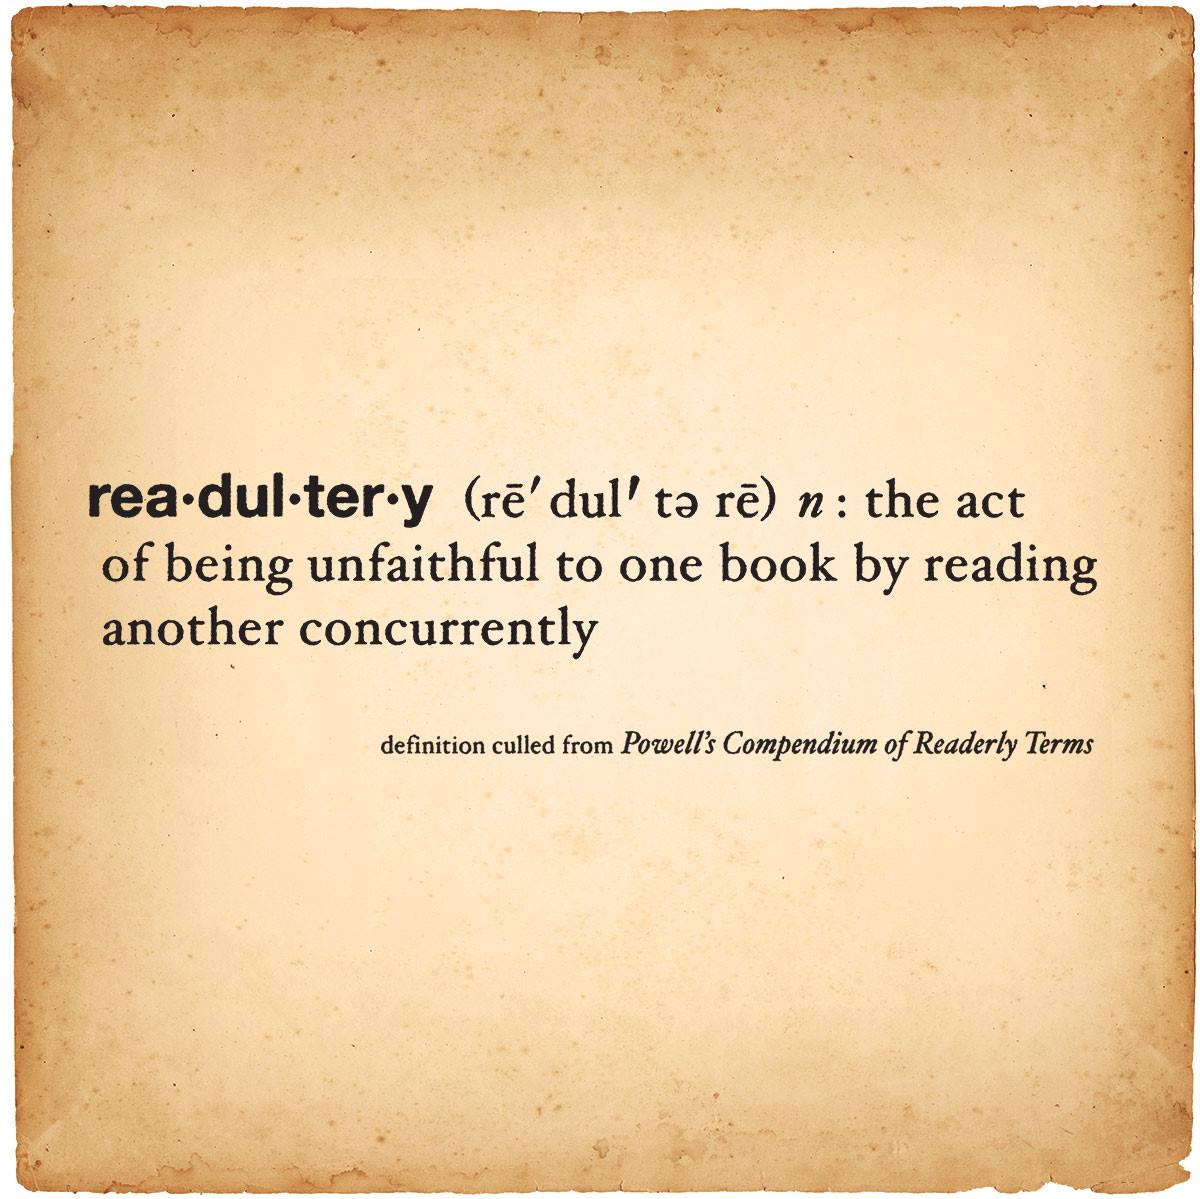 readultery